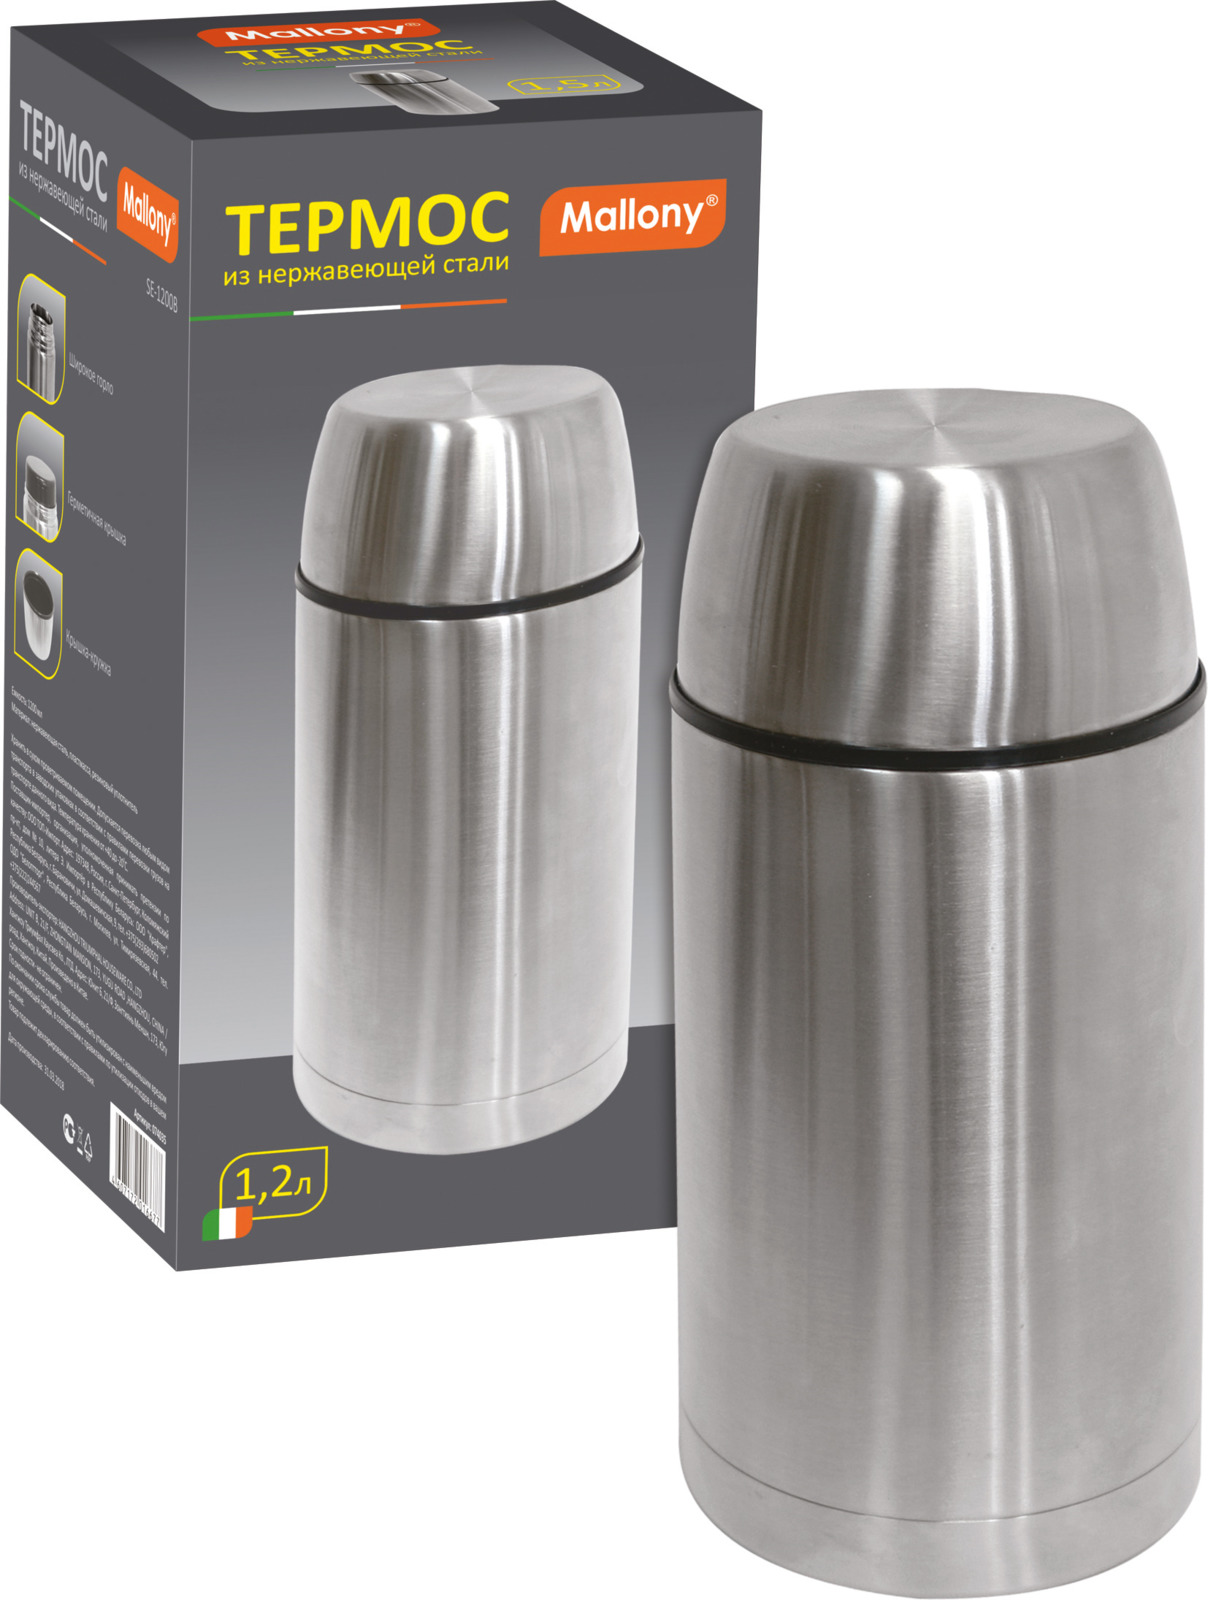 Термос Mallony, суповой, цвет: серебристый, 1,2 л mallony термос t85100 1 0 л широкое горло mallony